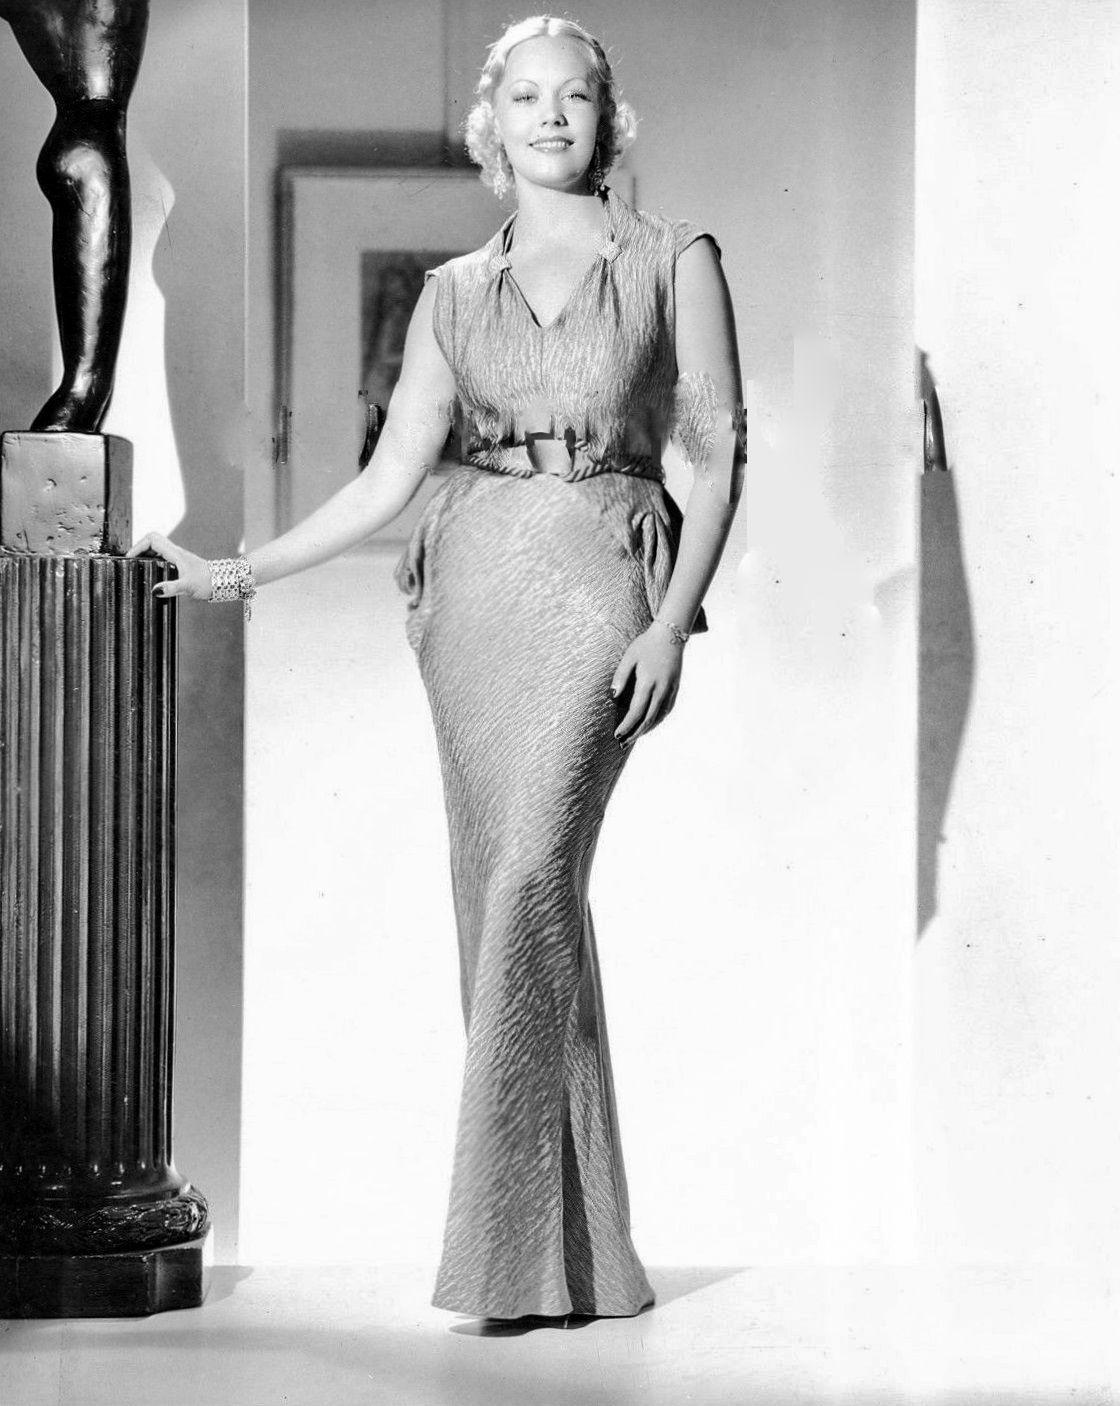 Annabelle Huggins (b. 1943),Swaran Lata XXX image Kimberley Simms,Miria Di San Servolo (1923?991)